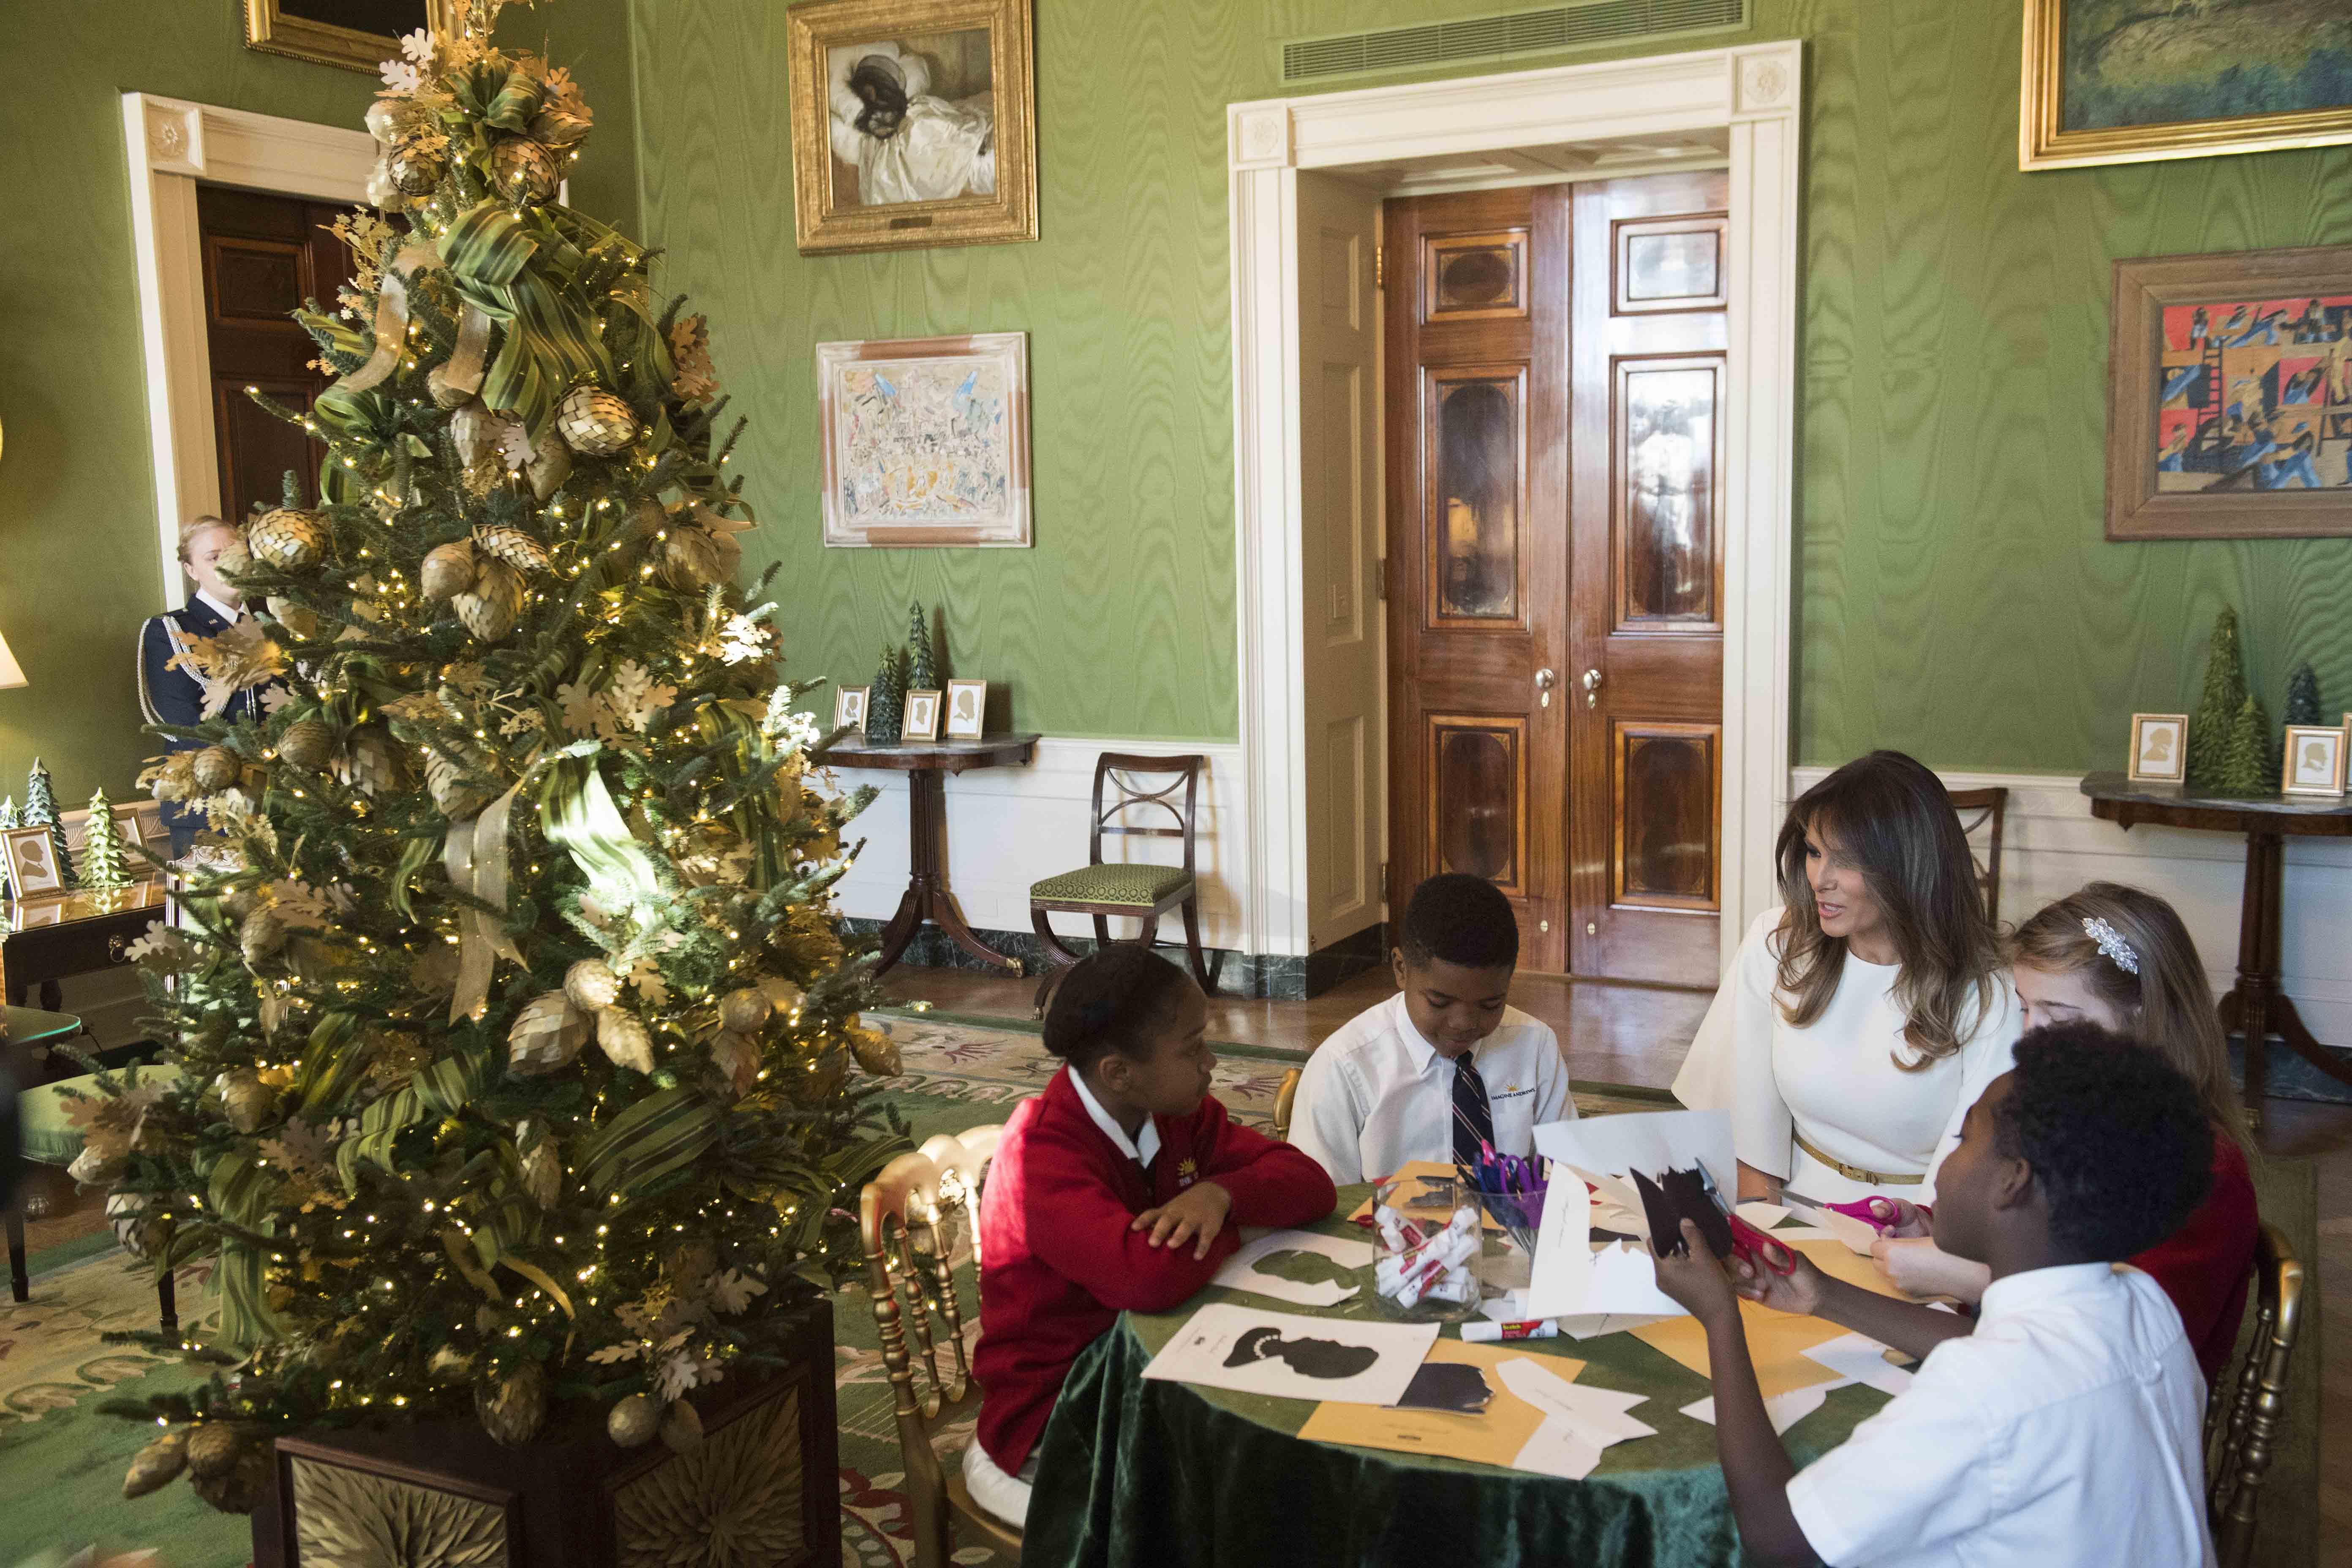 WHITE HOUSE,CHRISTMAS DECORATIONS,MELANIA TRUMP,2017